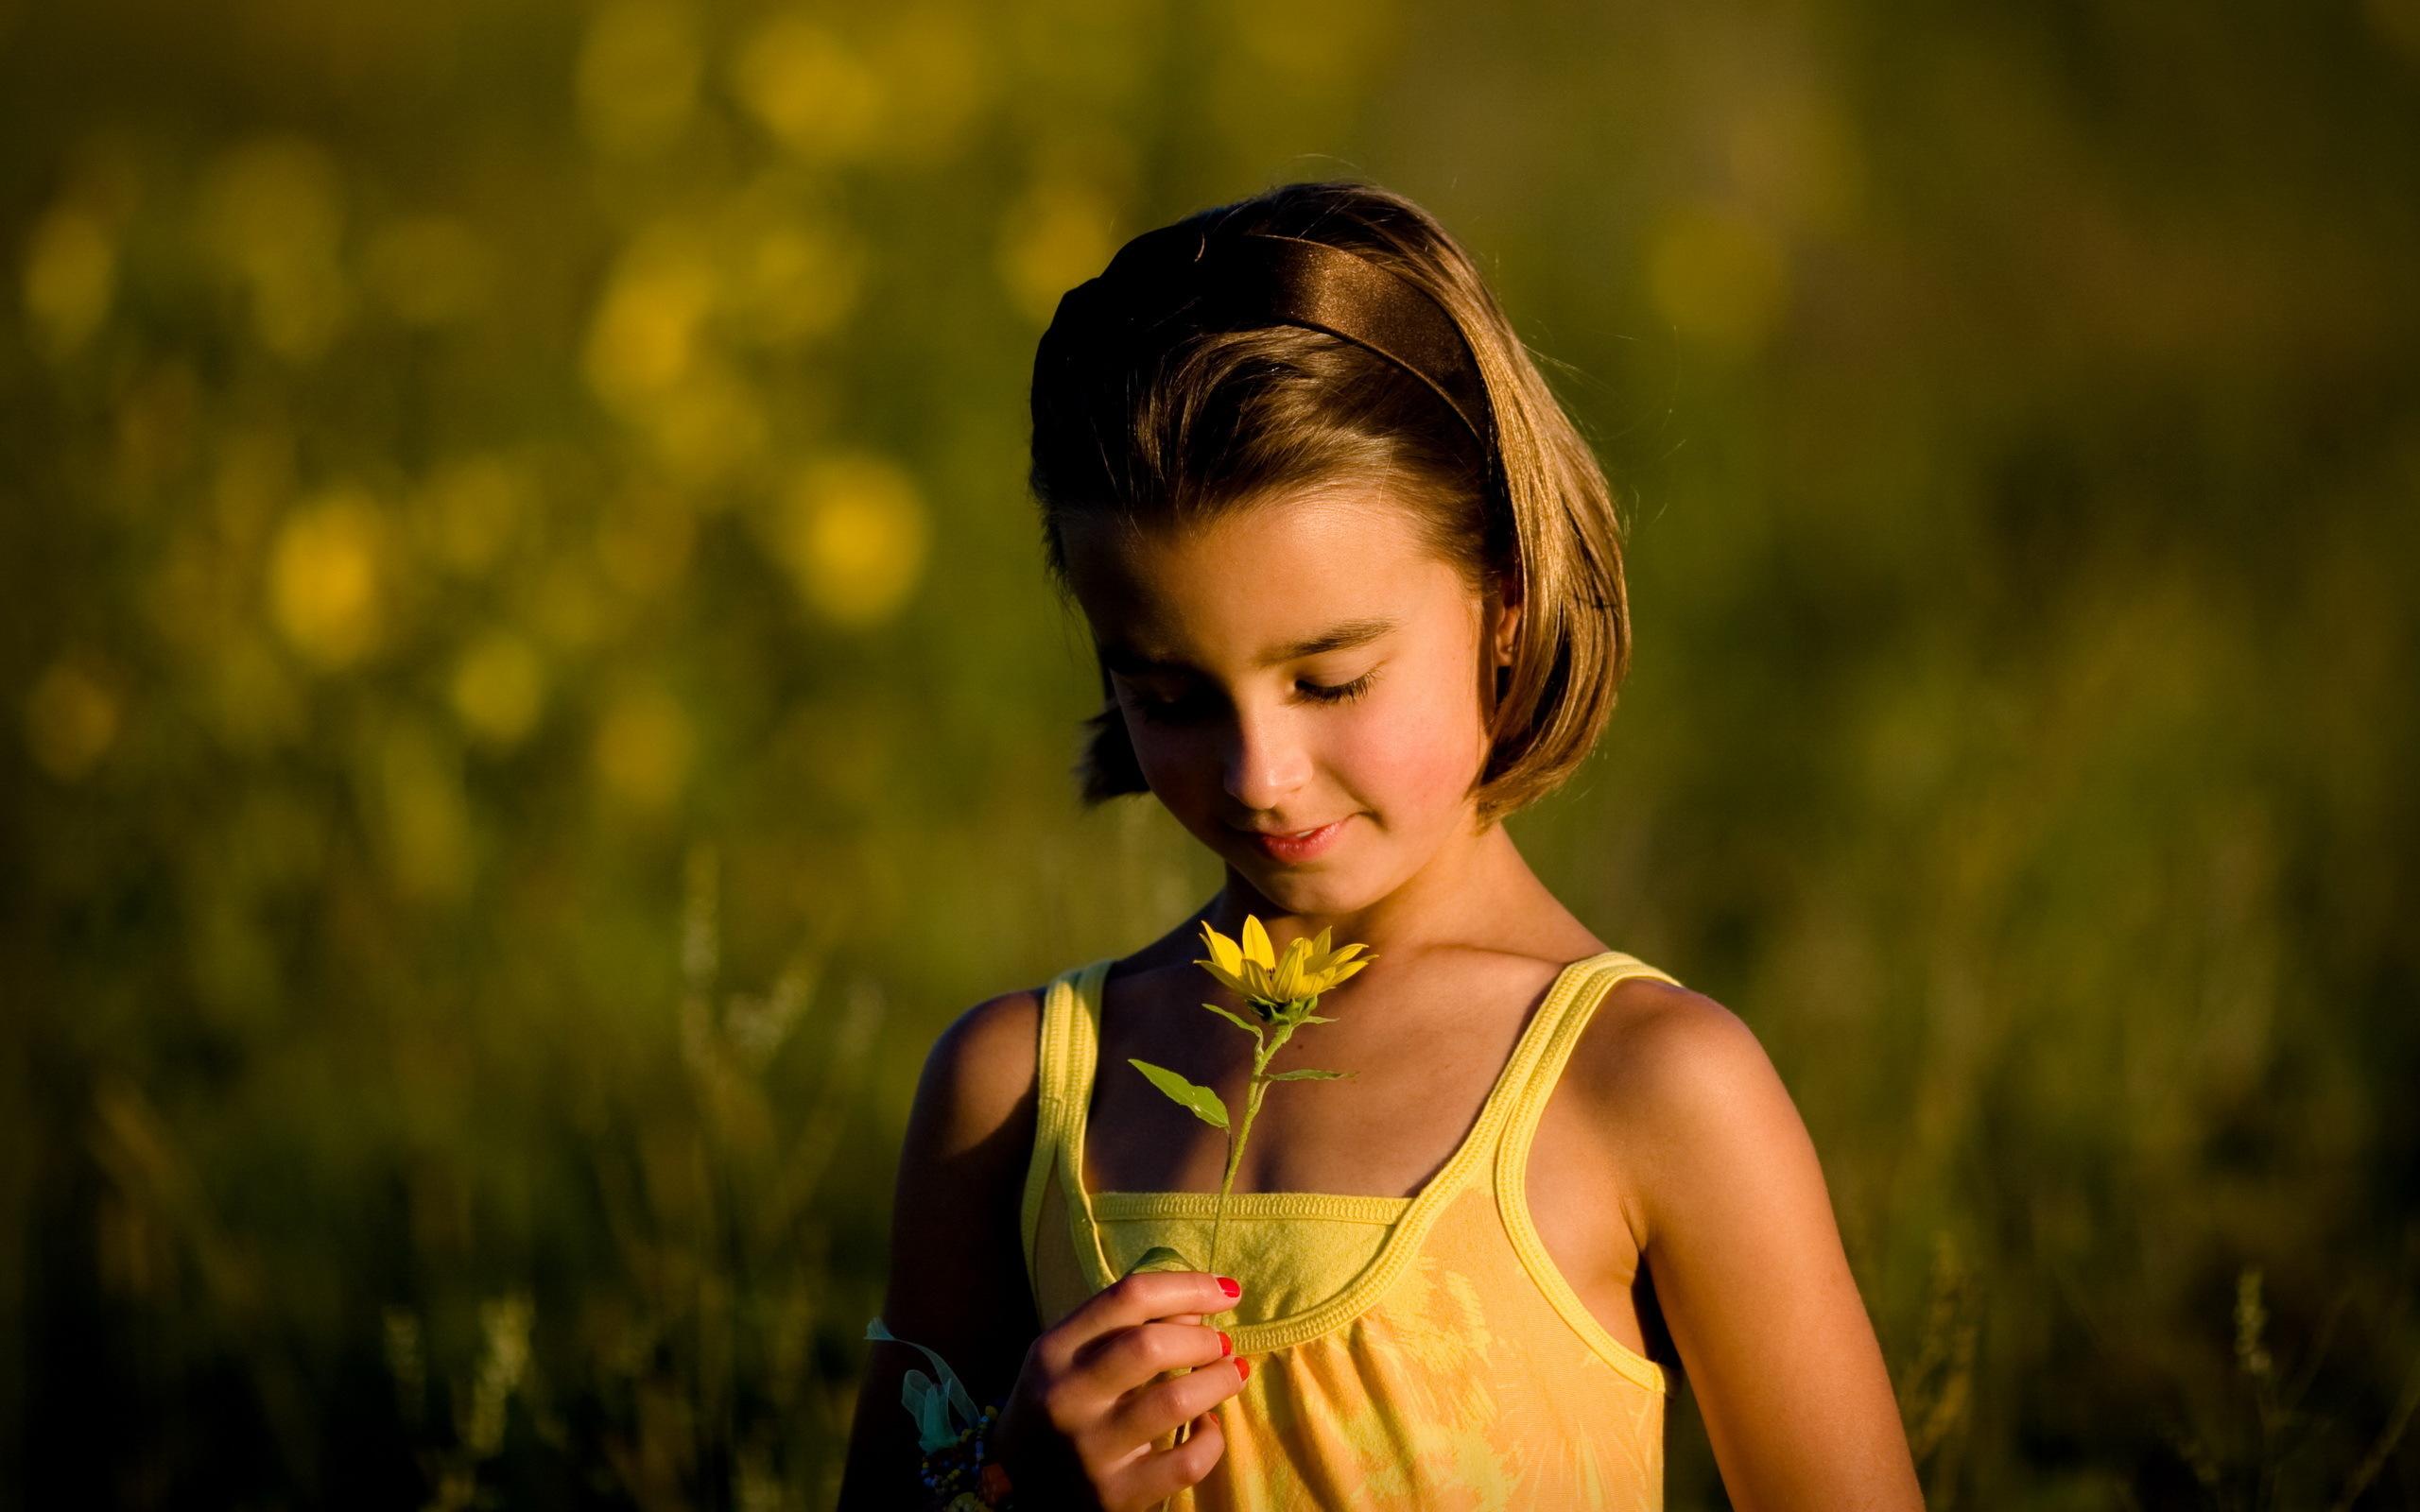 ребенок девочка  № 3563295 бесплатно